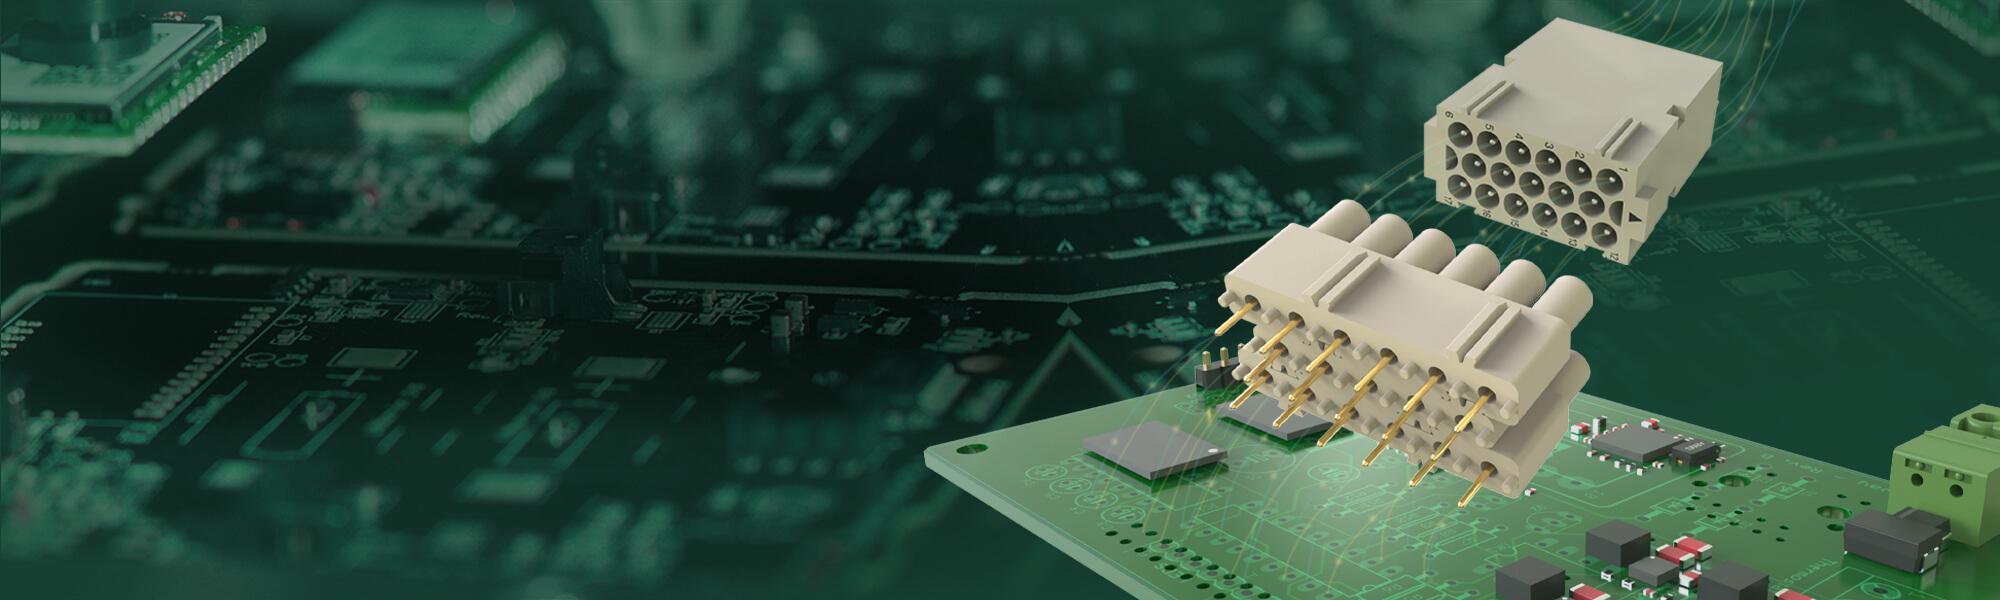 CIF-X17-2-4-PCB-adapter